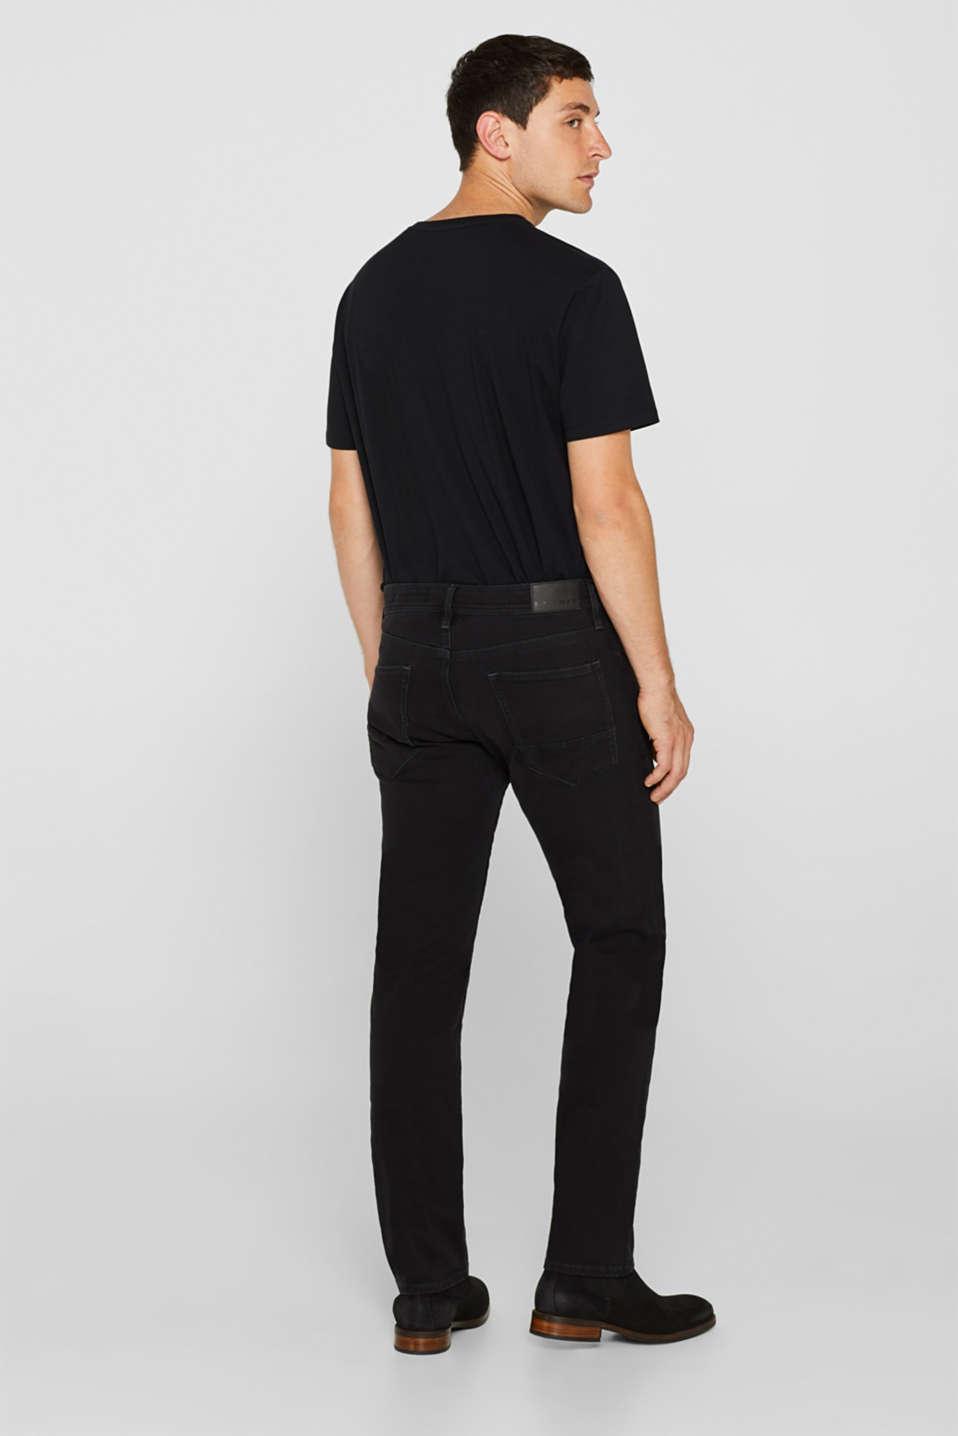 Pants denim, BLACK DARK WASH, detail image number 1